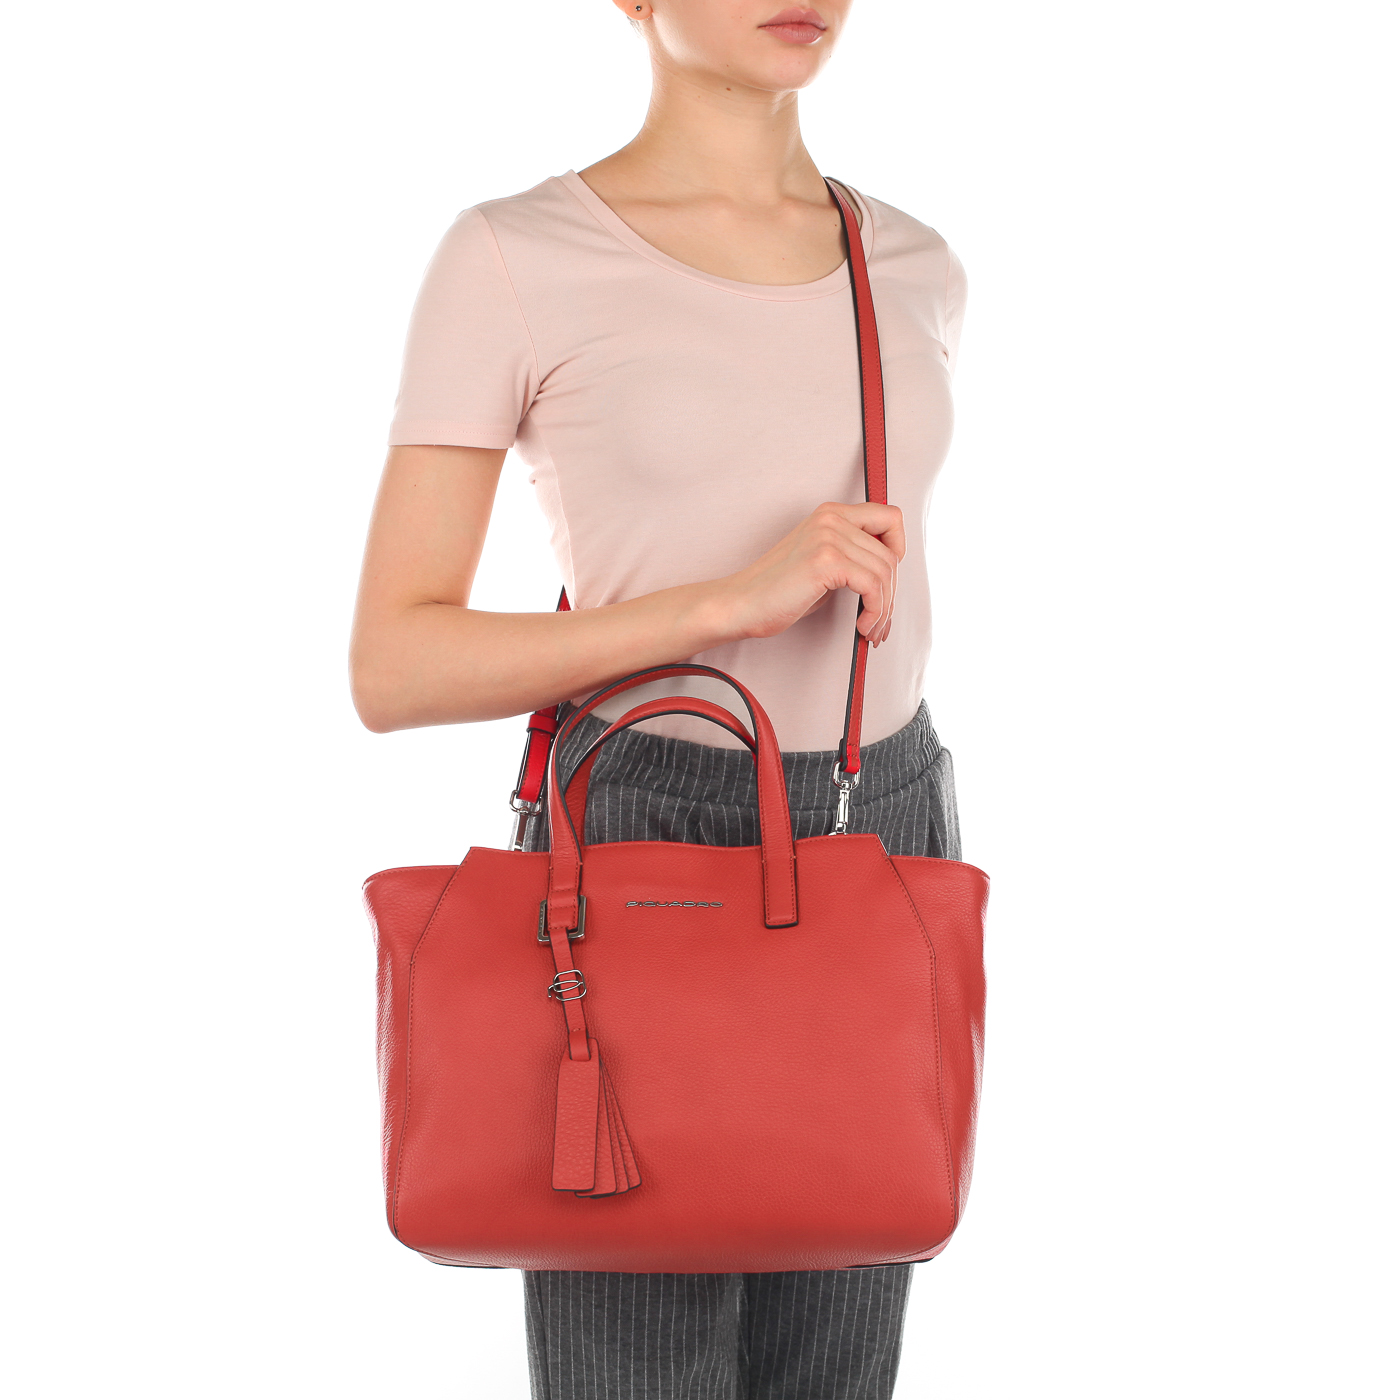 16d3c3fbea09 Женская сумка из красной кожи Piquadro Muse BD4326MU/R ...